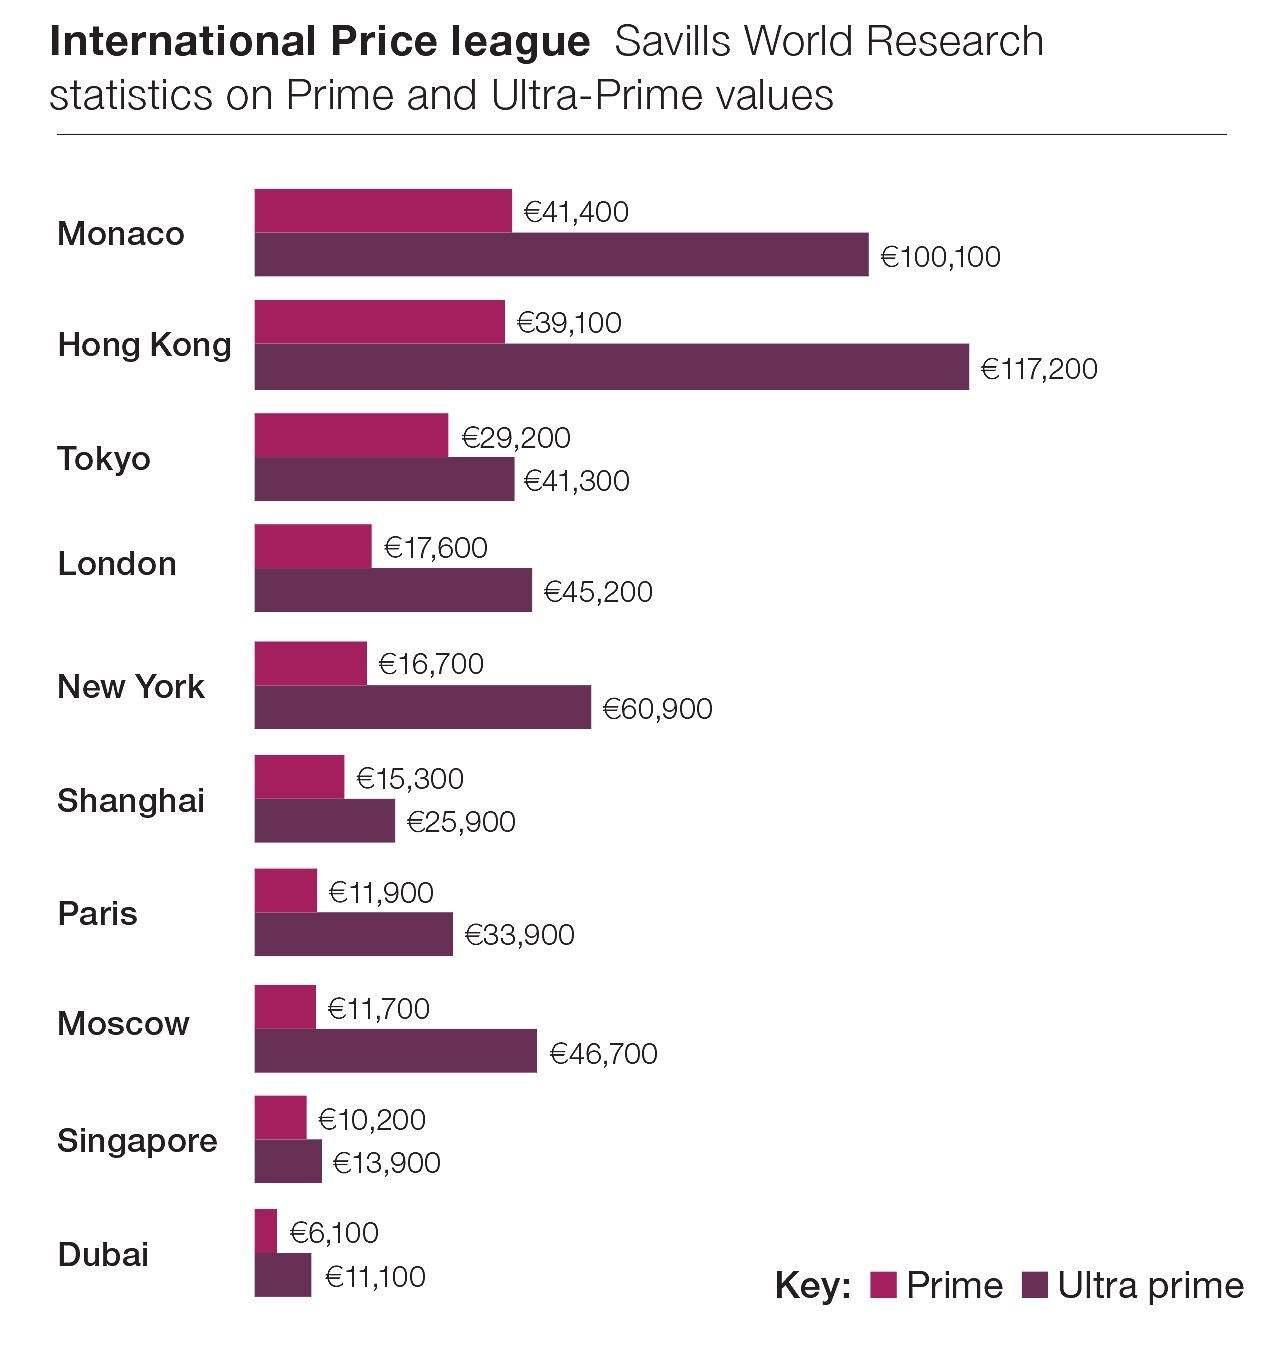 International Price League